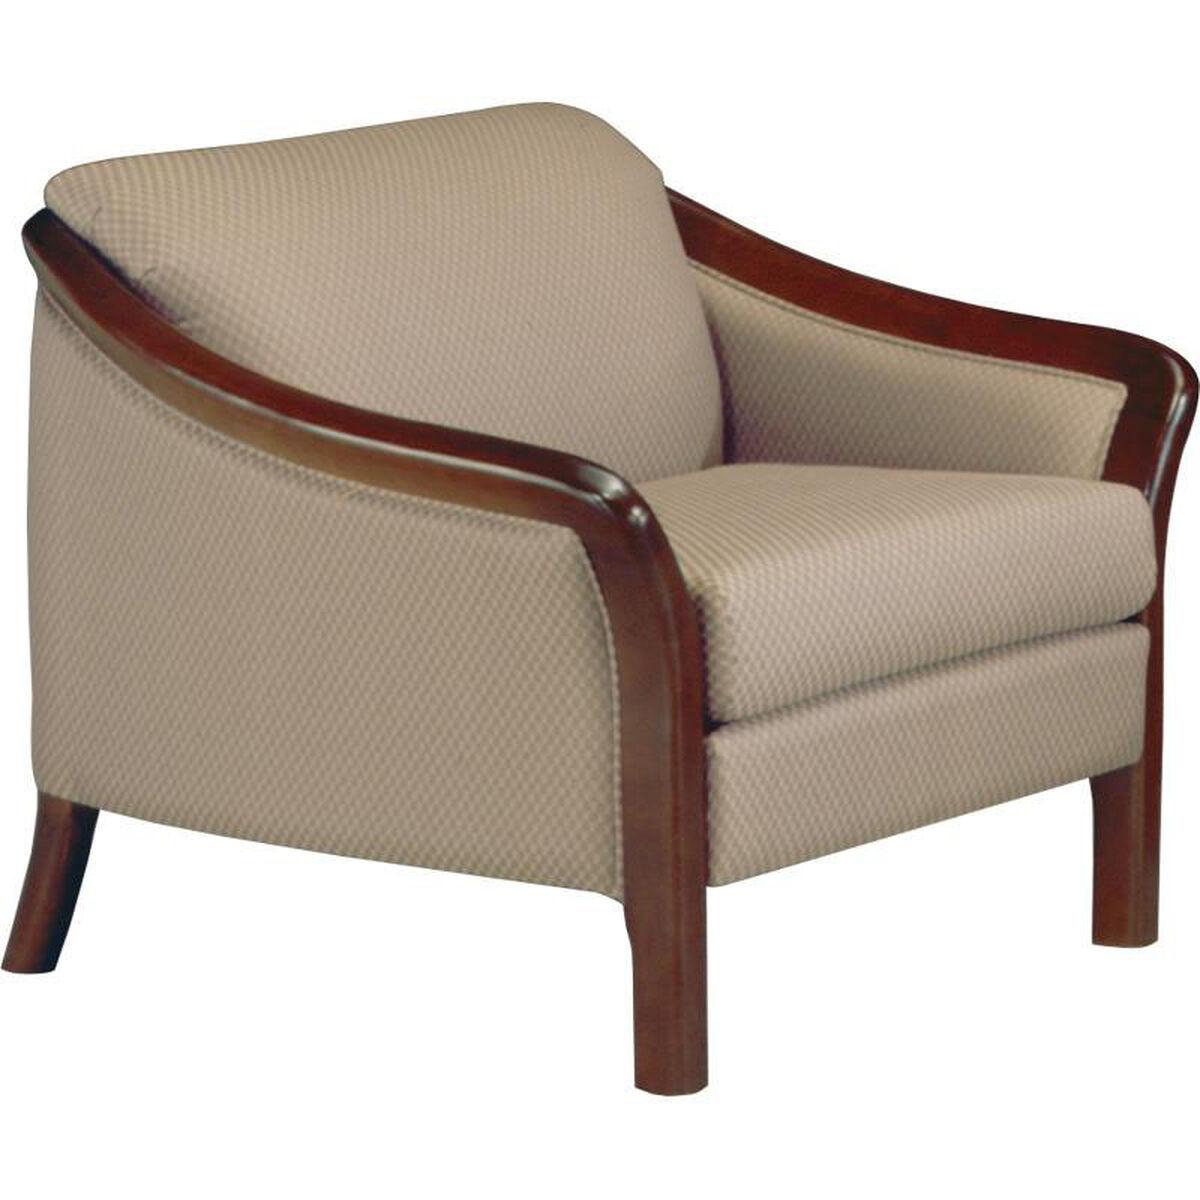 High Point Furniture Industries 9131 Hpf